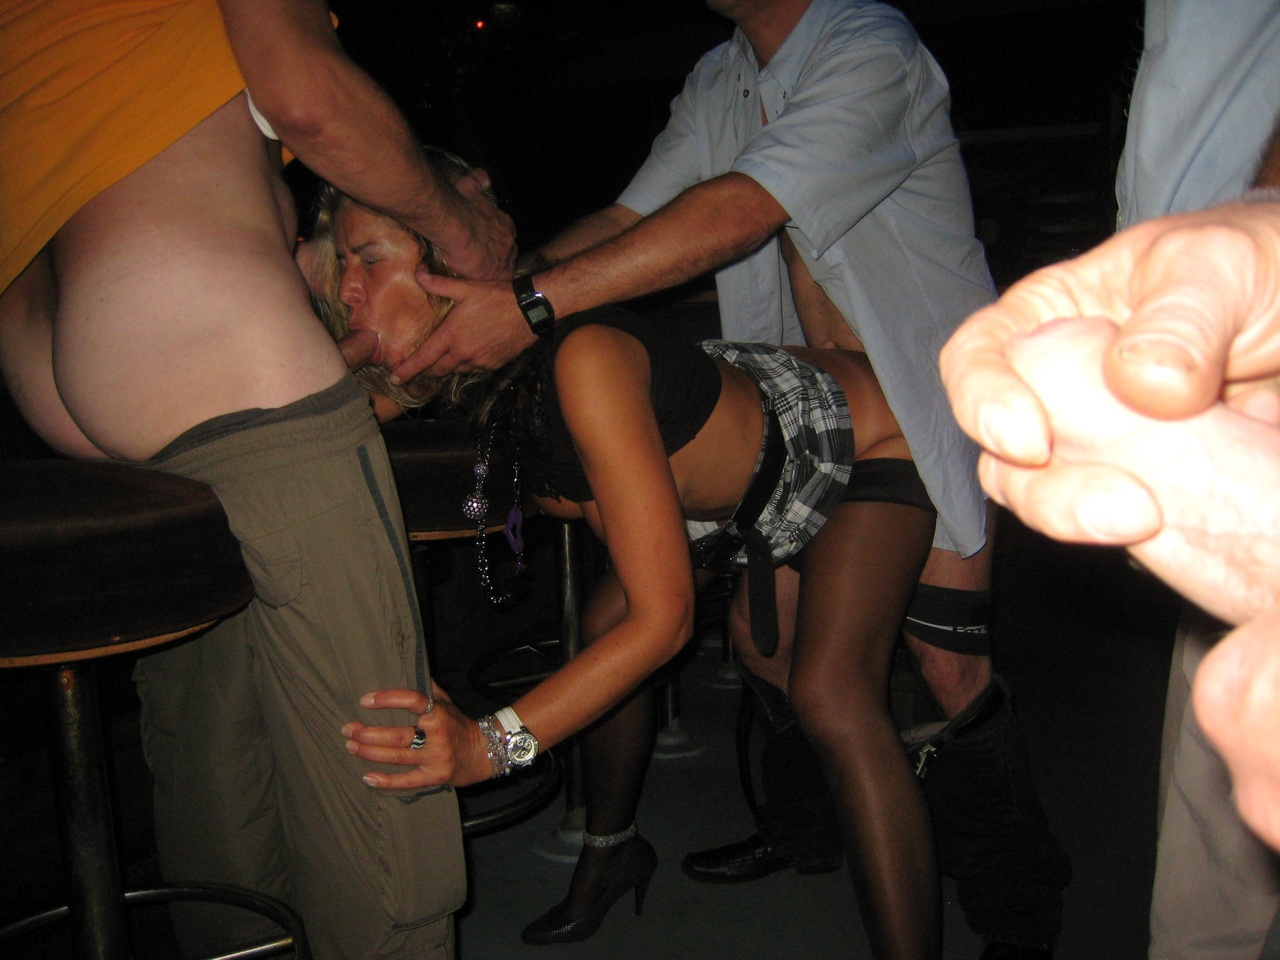 Swinger wife getting fucked in club bathroom